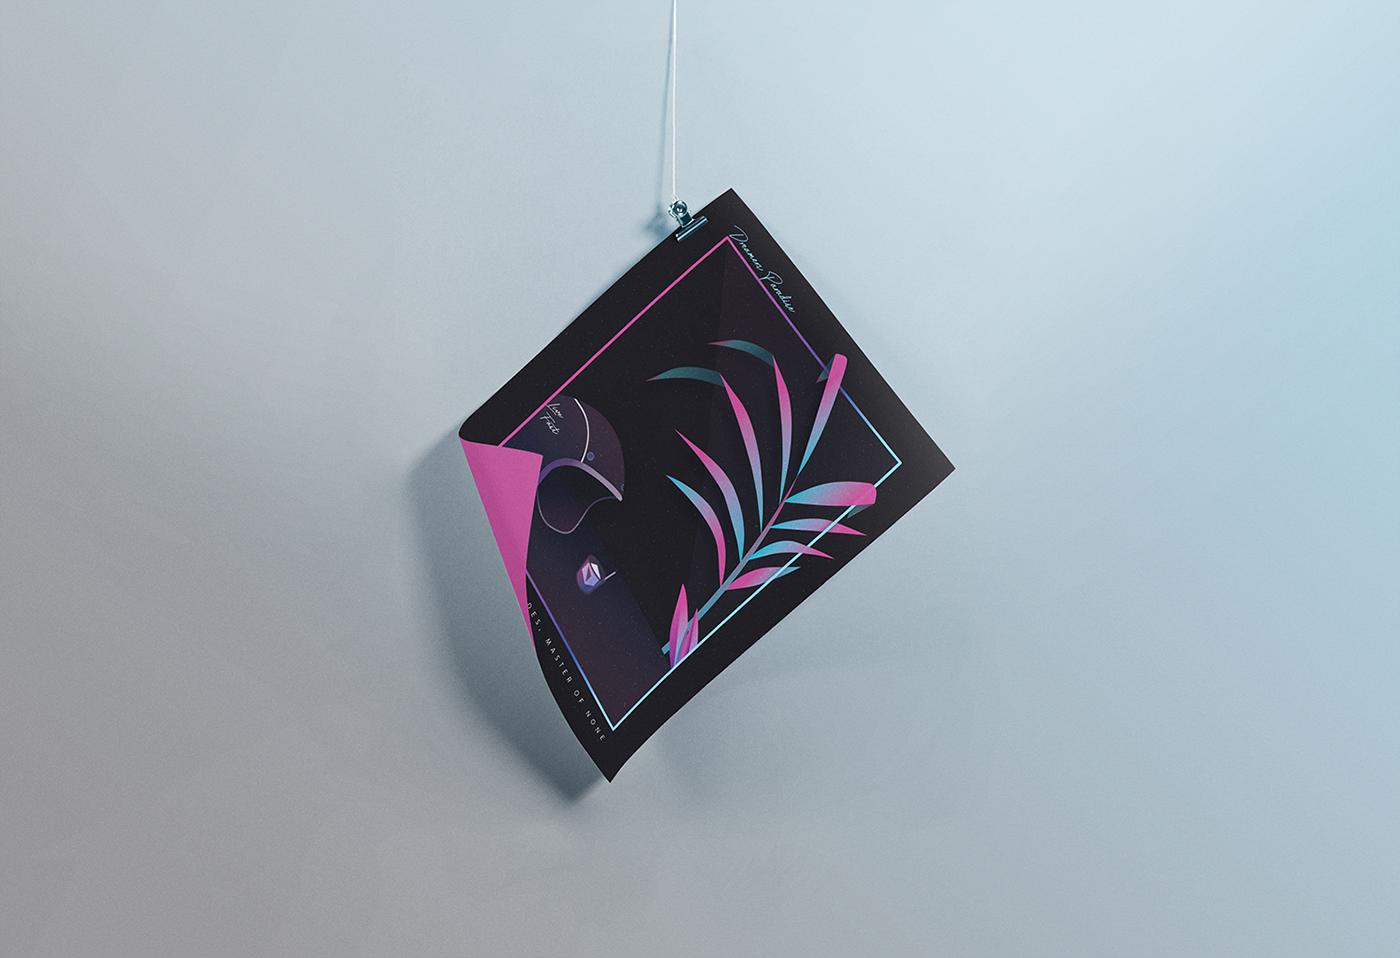 colorful dark vector art plants story Beach house master of none gradient poster cover photo design Illustrator moto motor cycle Helmet